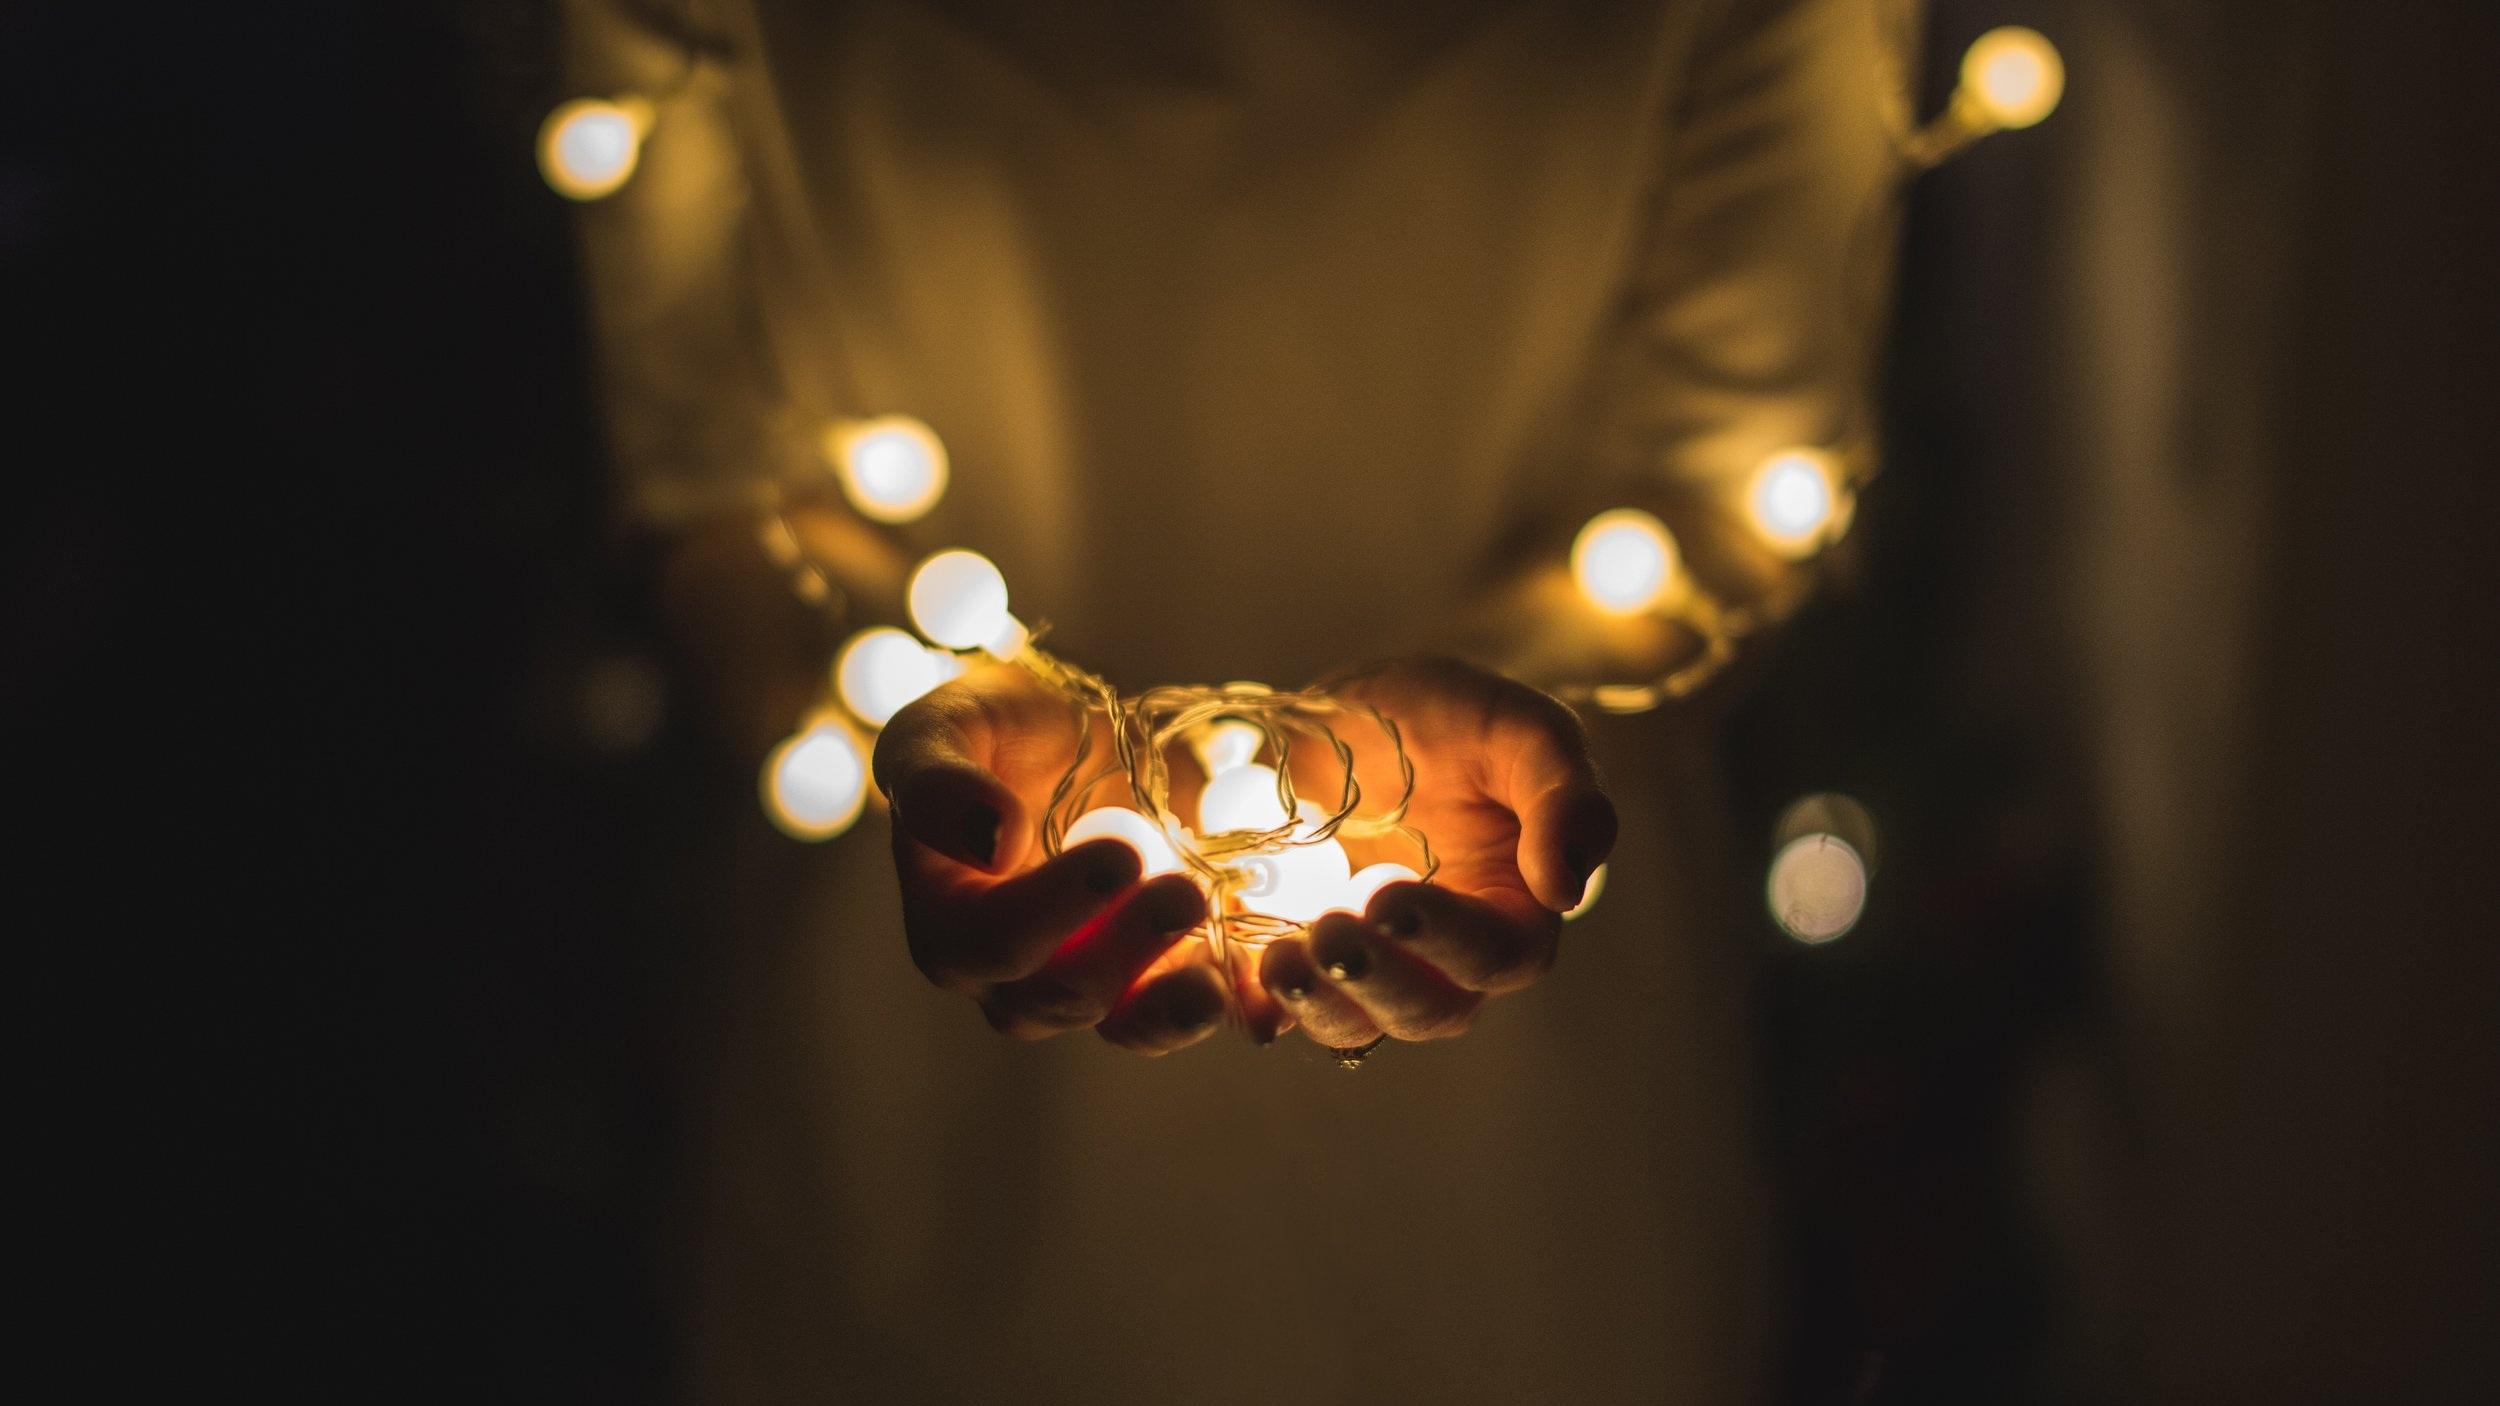 glow-forth-reiki-sf-healing-what-is-reiki